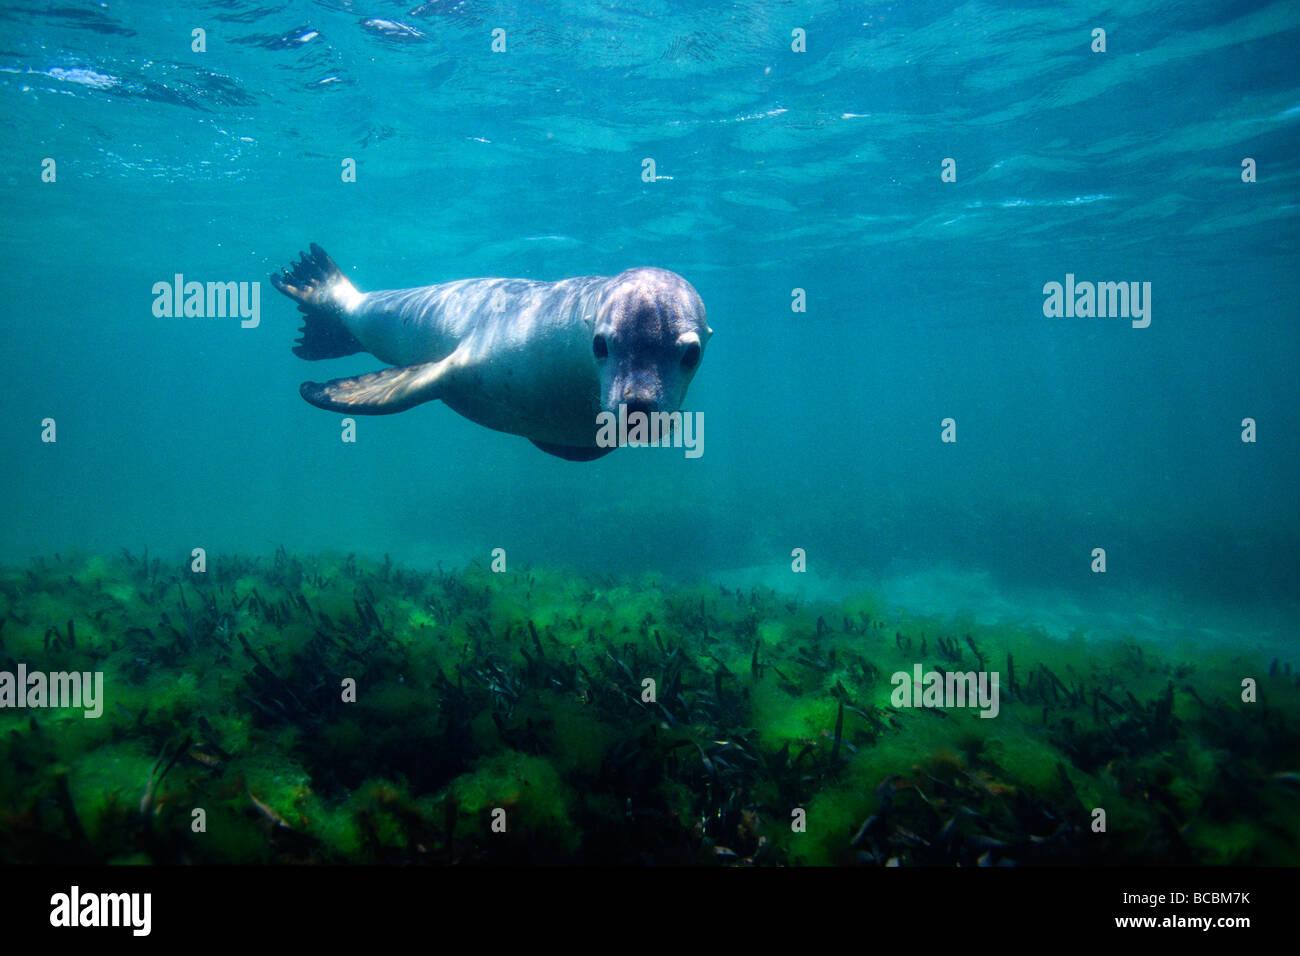 Lobo de mar nadar Imagen De Stock